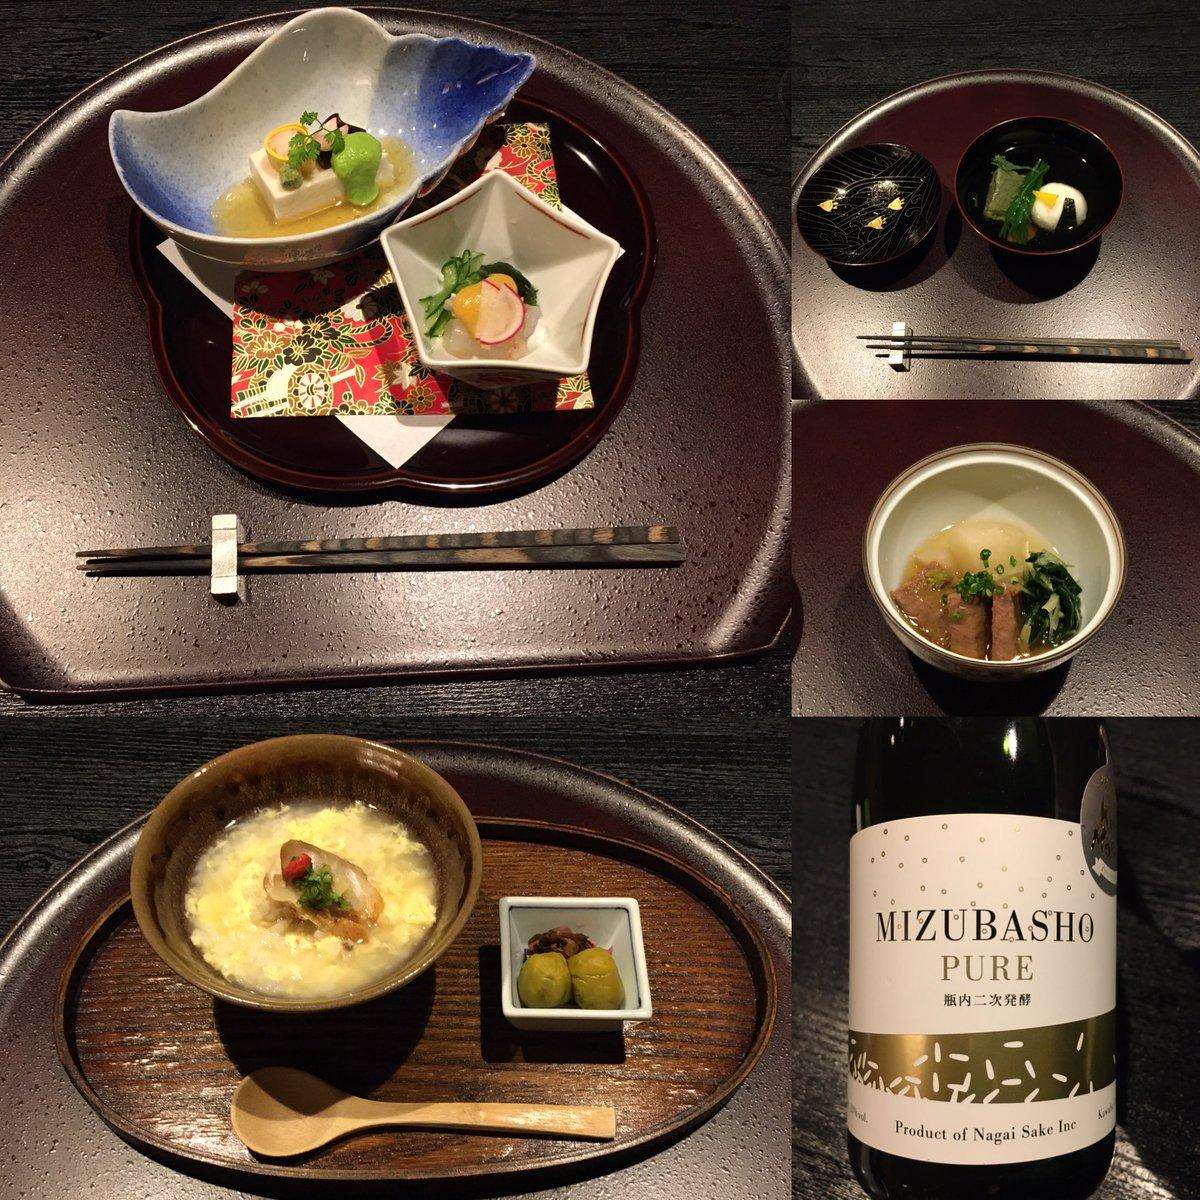 test ツイッターメディア - 同僚と日本料理  一品一品優しく温かいお料理  お供は水芭蕉 瓶内二次発酵の日本酒スパークリング  食前はフルーティかつ爽やか 食中はふくよかな印象で料理としっかりマリアージュ アルコール13%でも飲み方によって合わせるのが楽しい  ごちそうさまでした!  #日本料理 #水芭蕉 #日本酒 #泡 https://t.co/DnawVecrpn